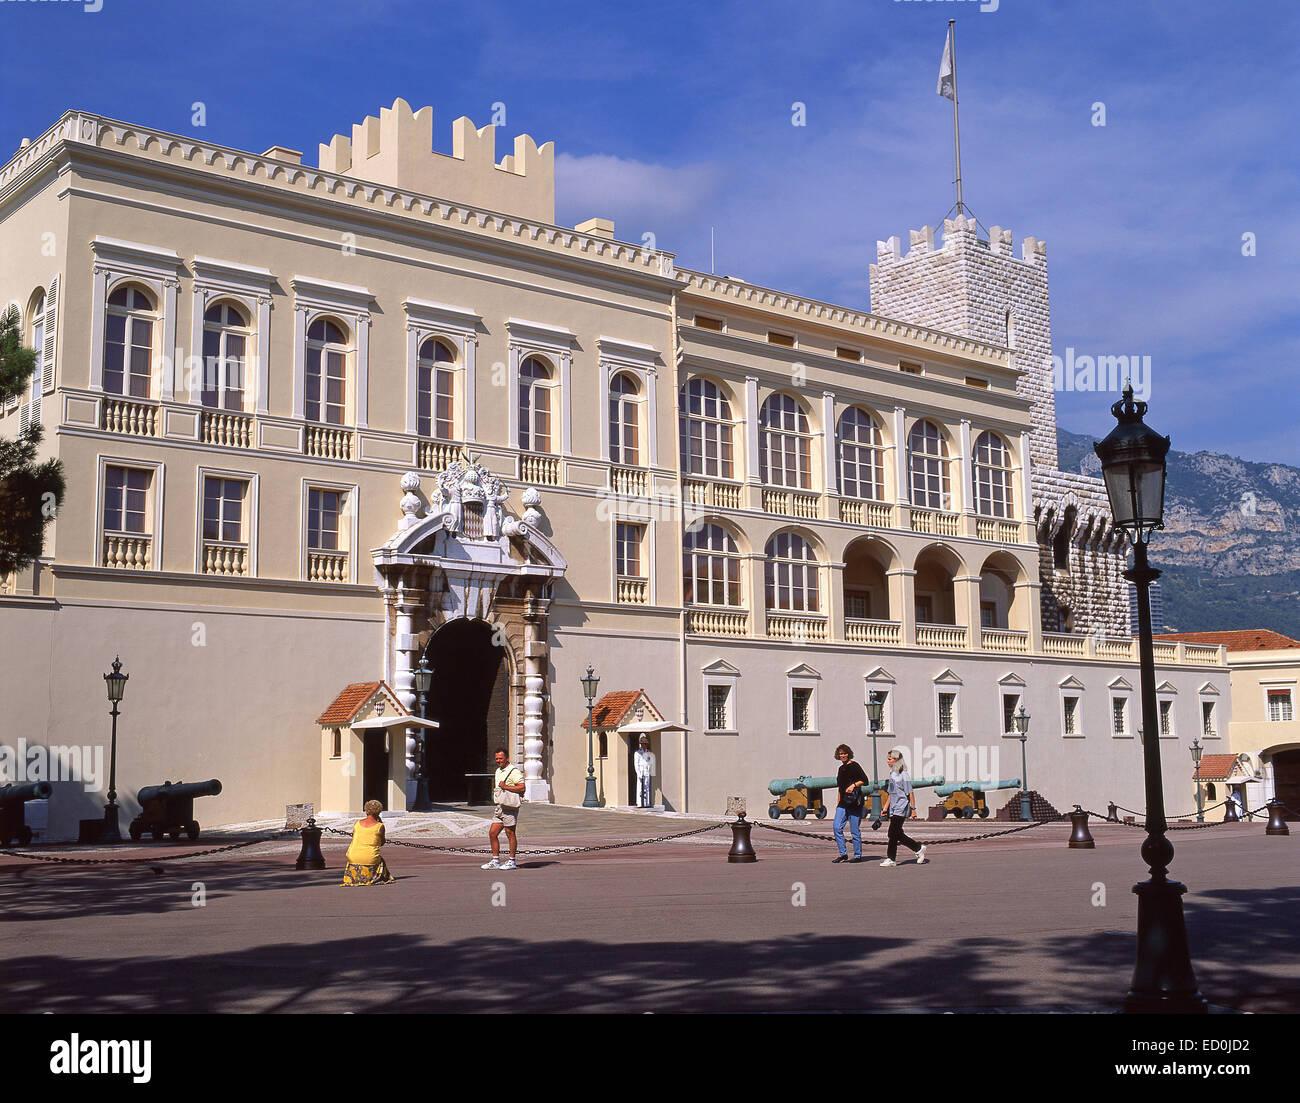 Palais Princier de Monaco, Place du Palais, Monaco-Ville, Principality of Monaco - Stock Image